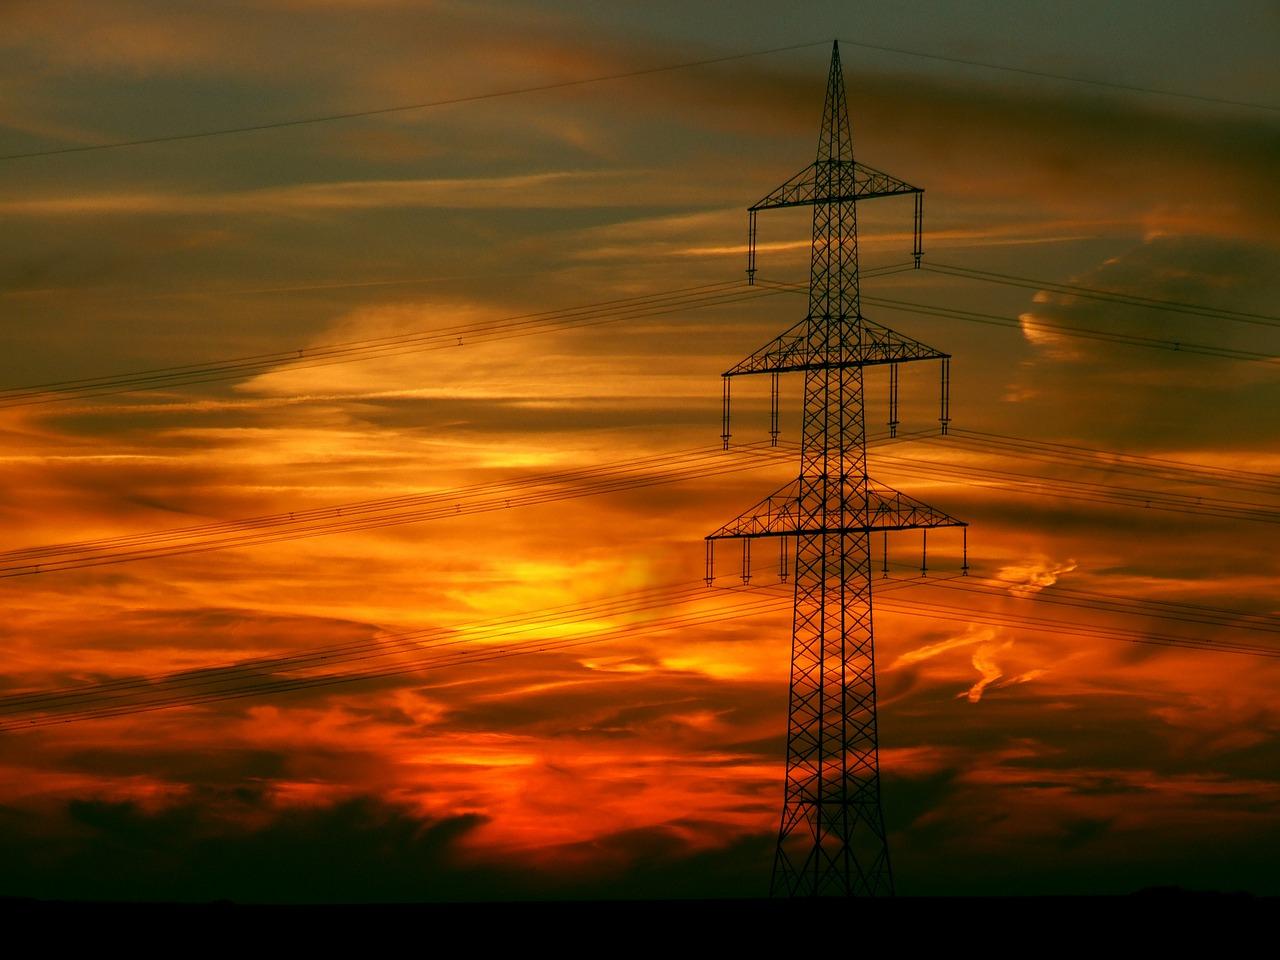 sunset-208771_1280